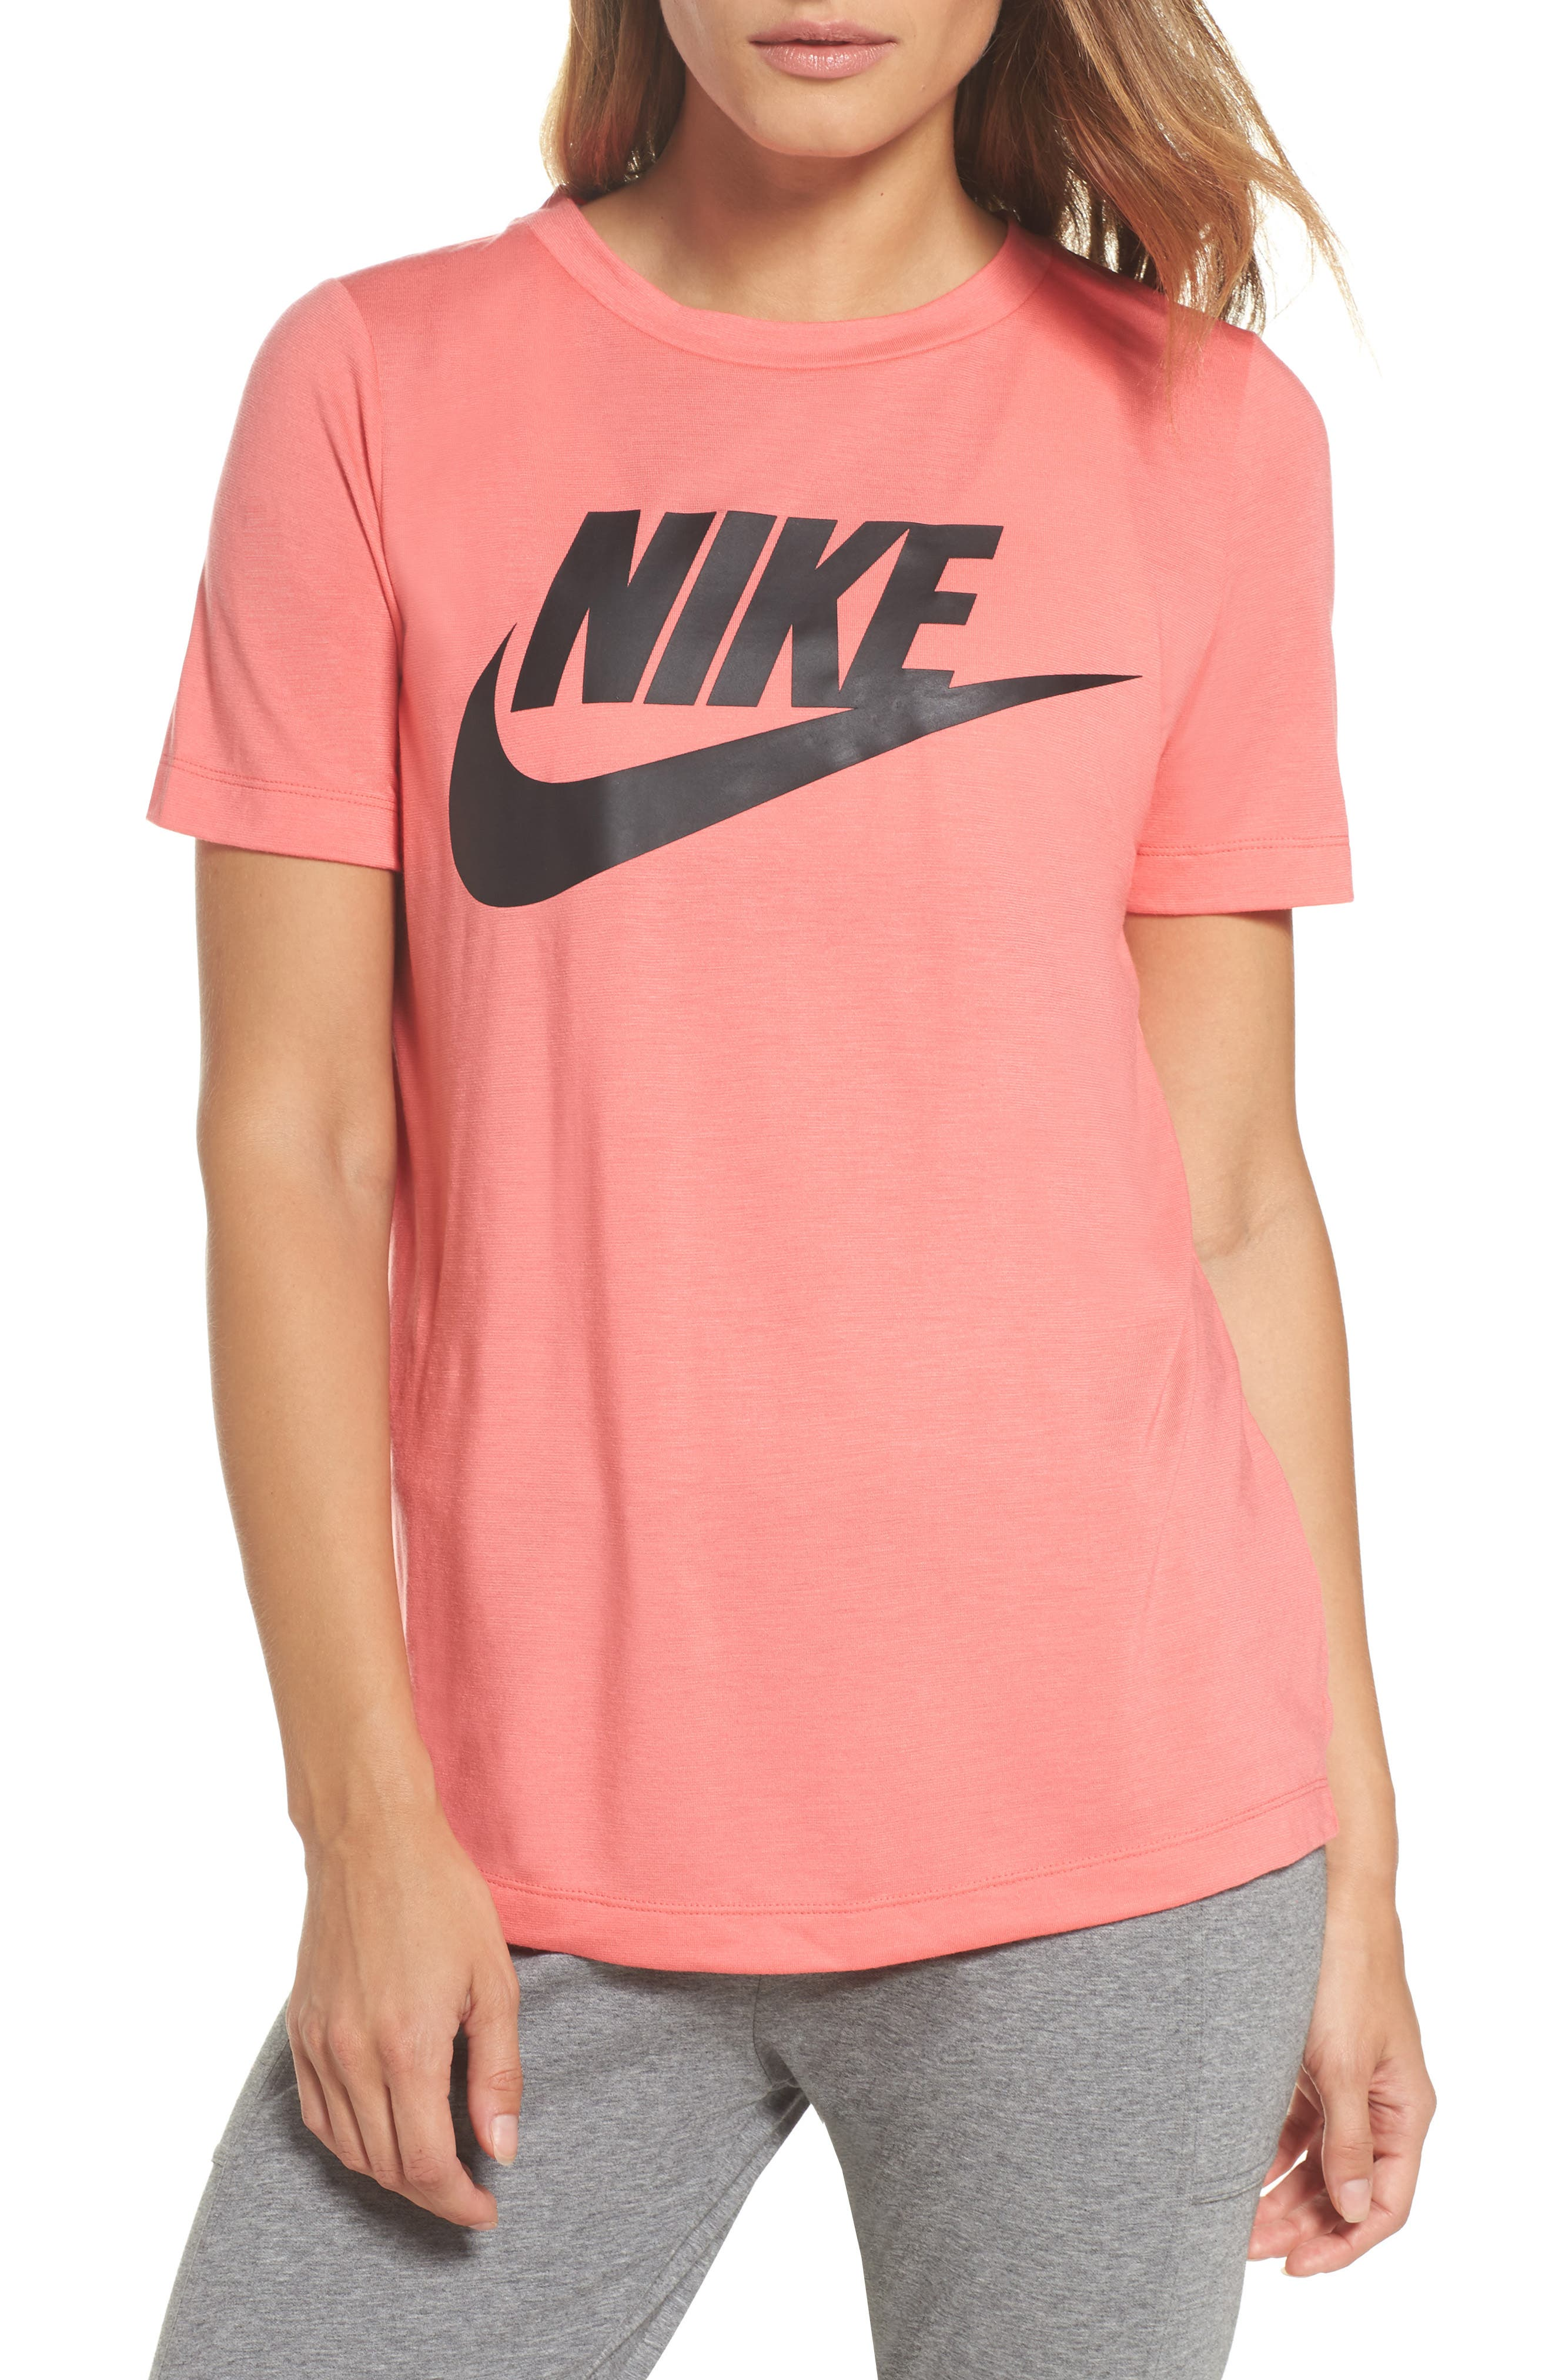 Sportswear Essential Tee,                             Main thumbnail 1, color,                             Sea Coral/ Sea Coral/ Black